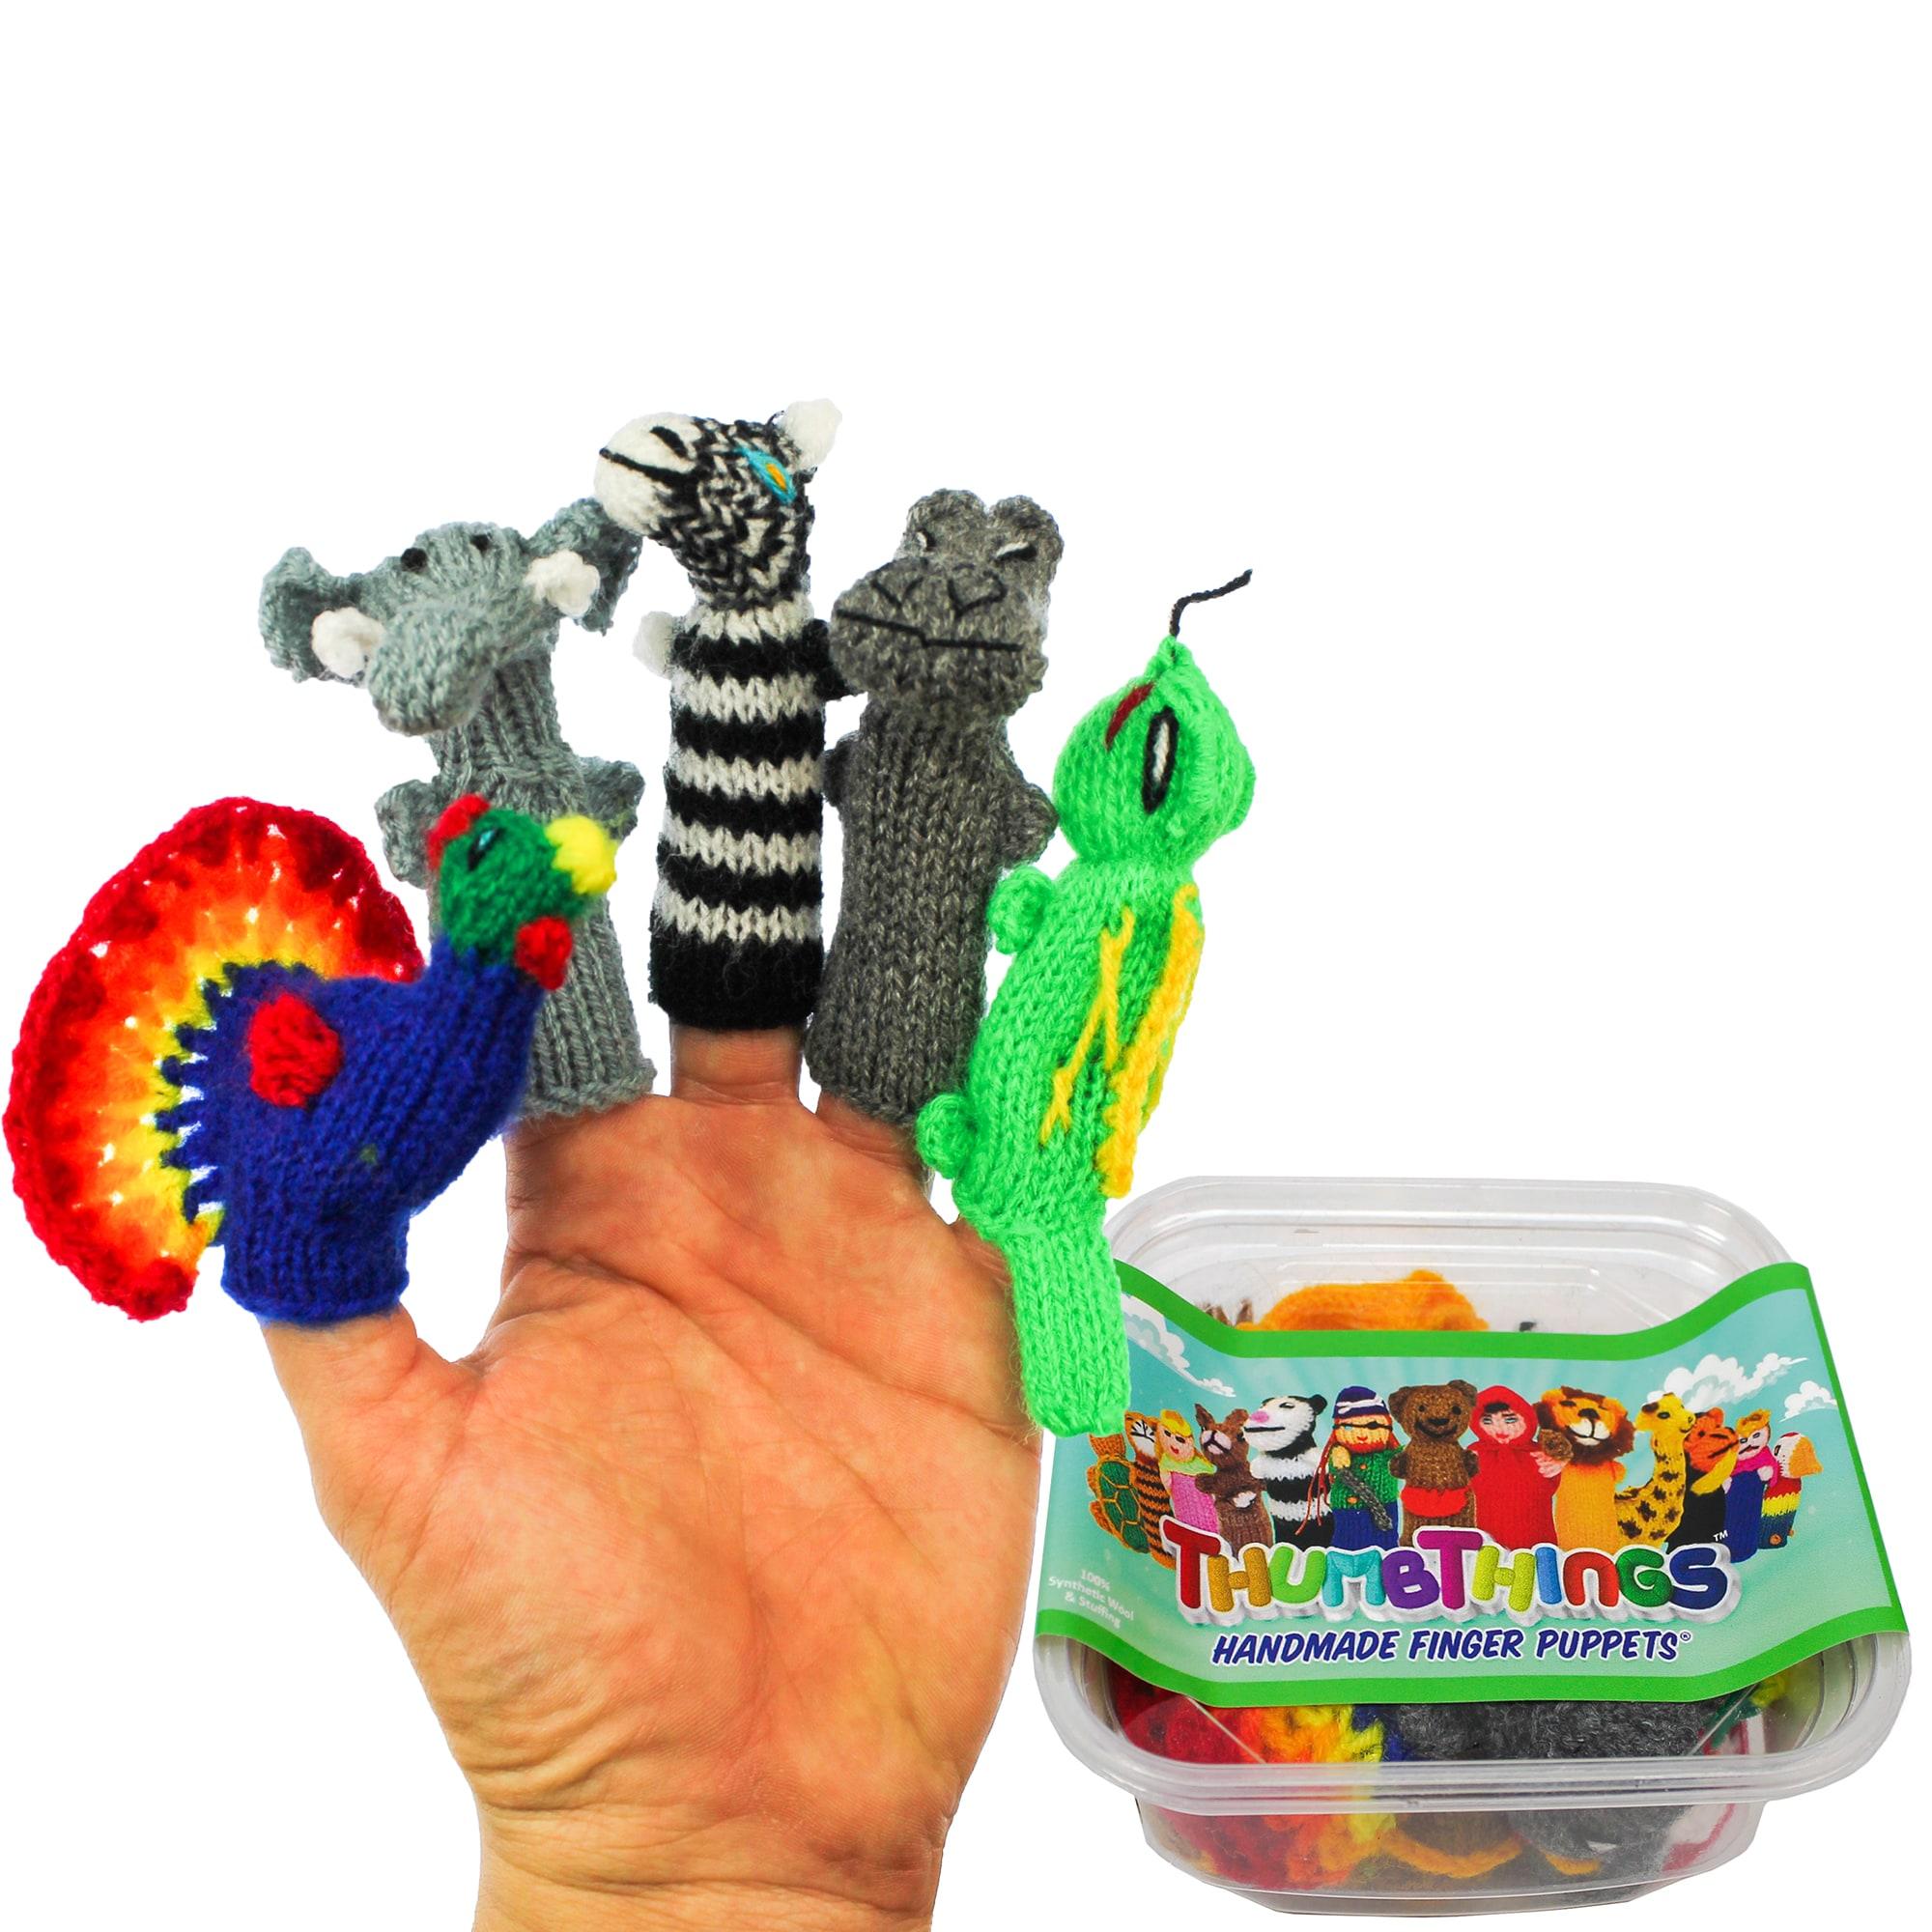 ThumbThings Handmade Finger Puppets, Set of 5: Peacock, E...